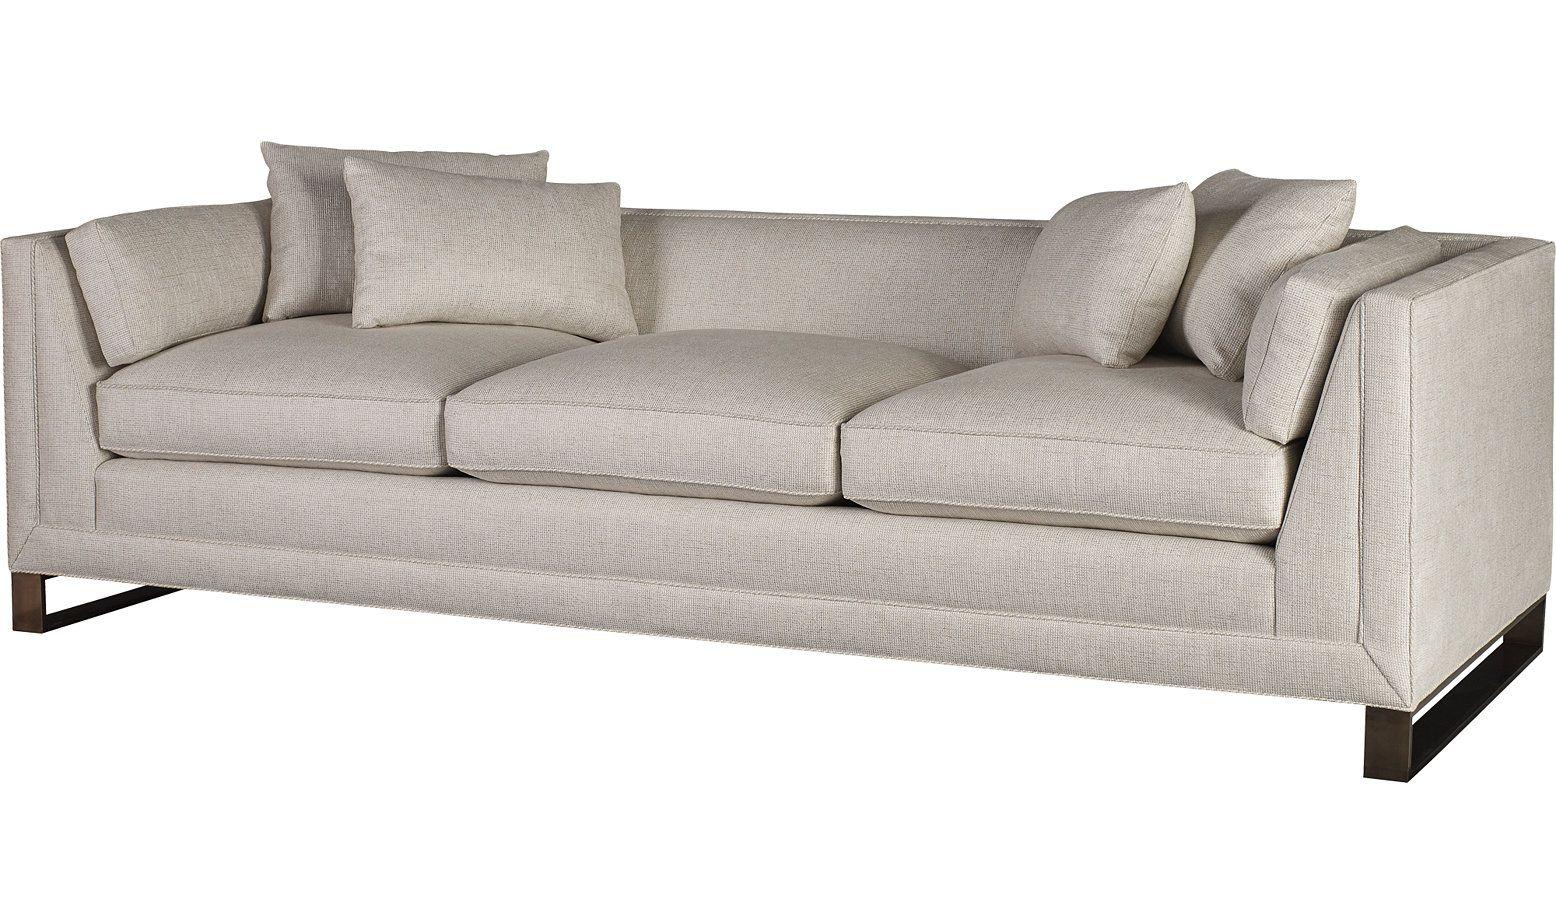 Admirable Surround Sofa By Barbara Barry 6734S Baker Furniture Machost Co Dining Chair Design Ideas Machostcouk